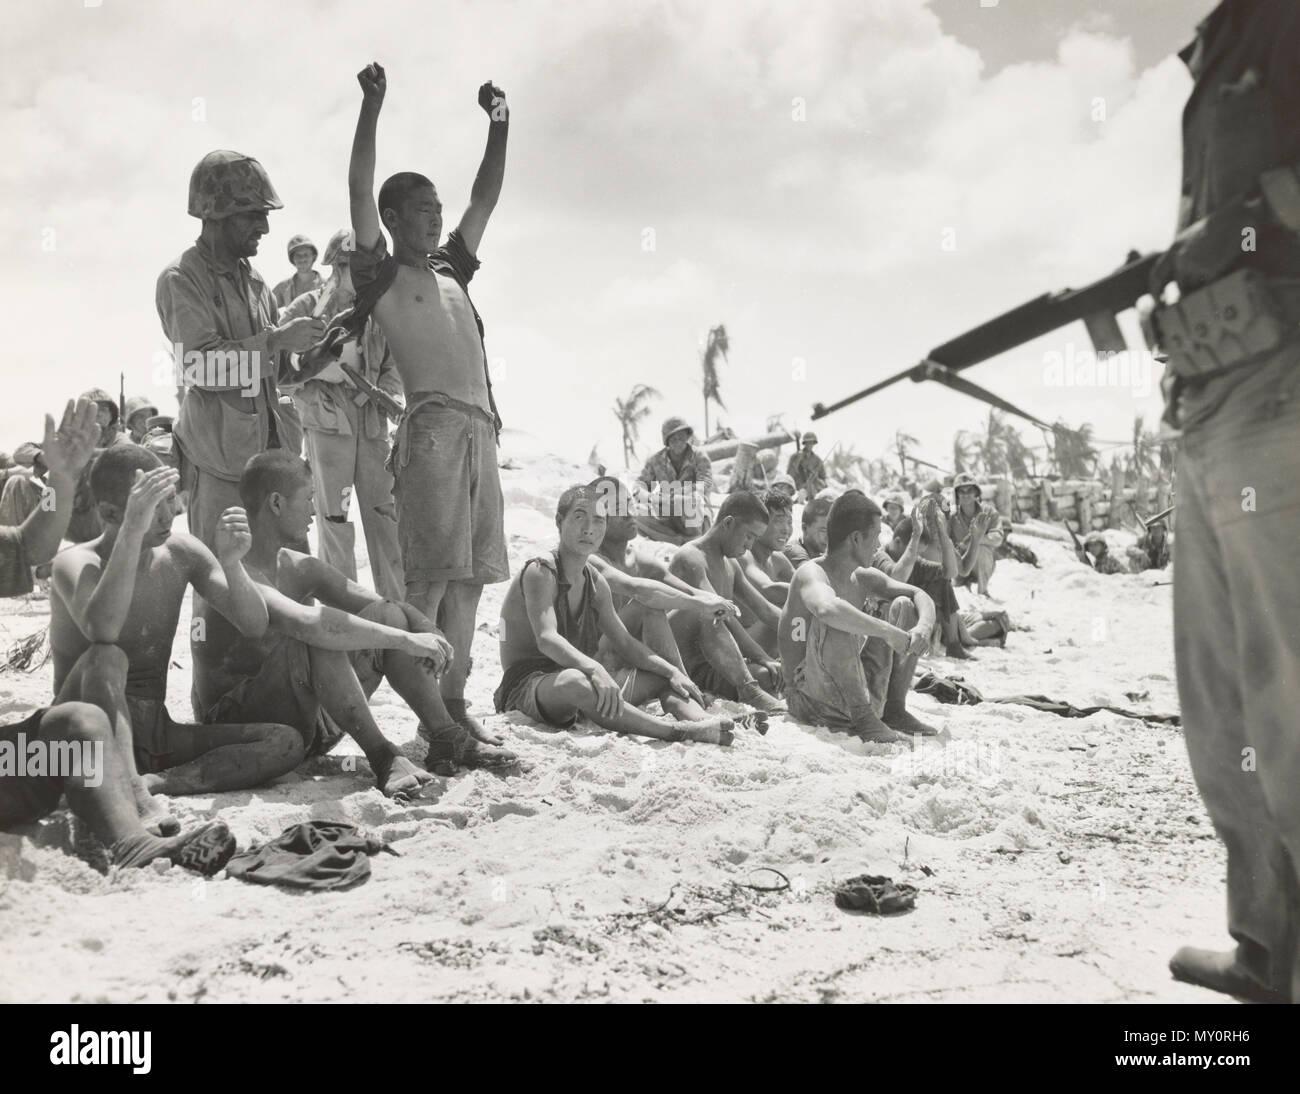 Japanese Prisoners in the battle of Tarawa - Stock Image